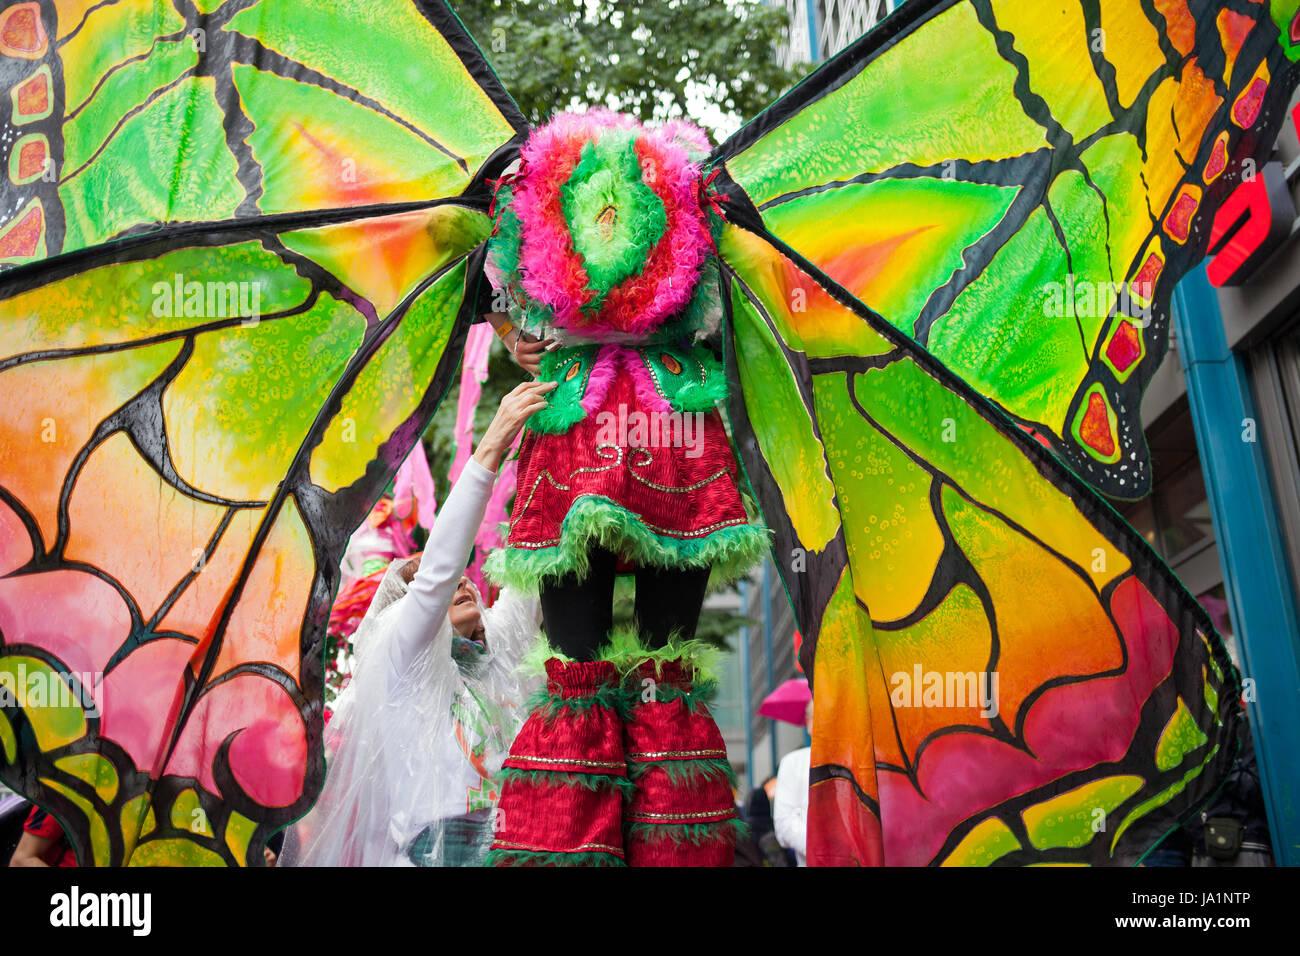 Berlin, Deutschland. 04. Juni 2017. Simon Becker/le pictorium - Karneval der Kulturen Berlin, 2017 - 04/06/2017 Stockbild